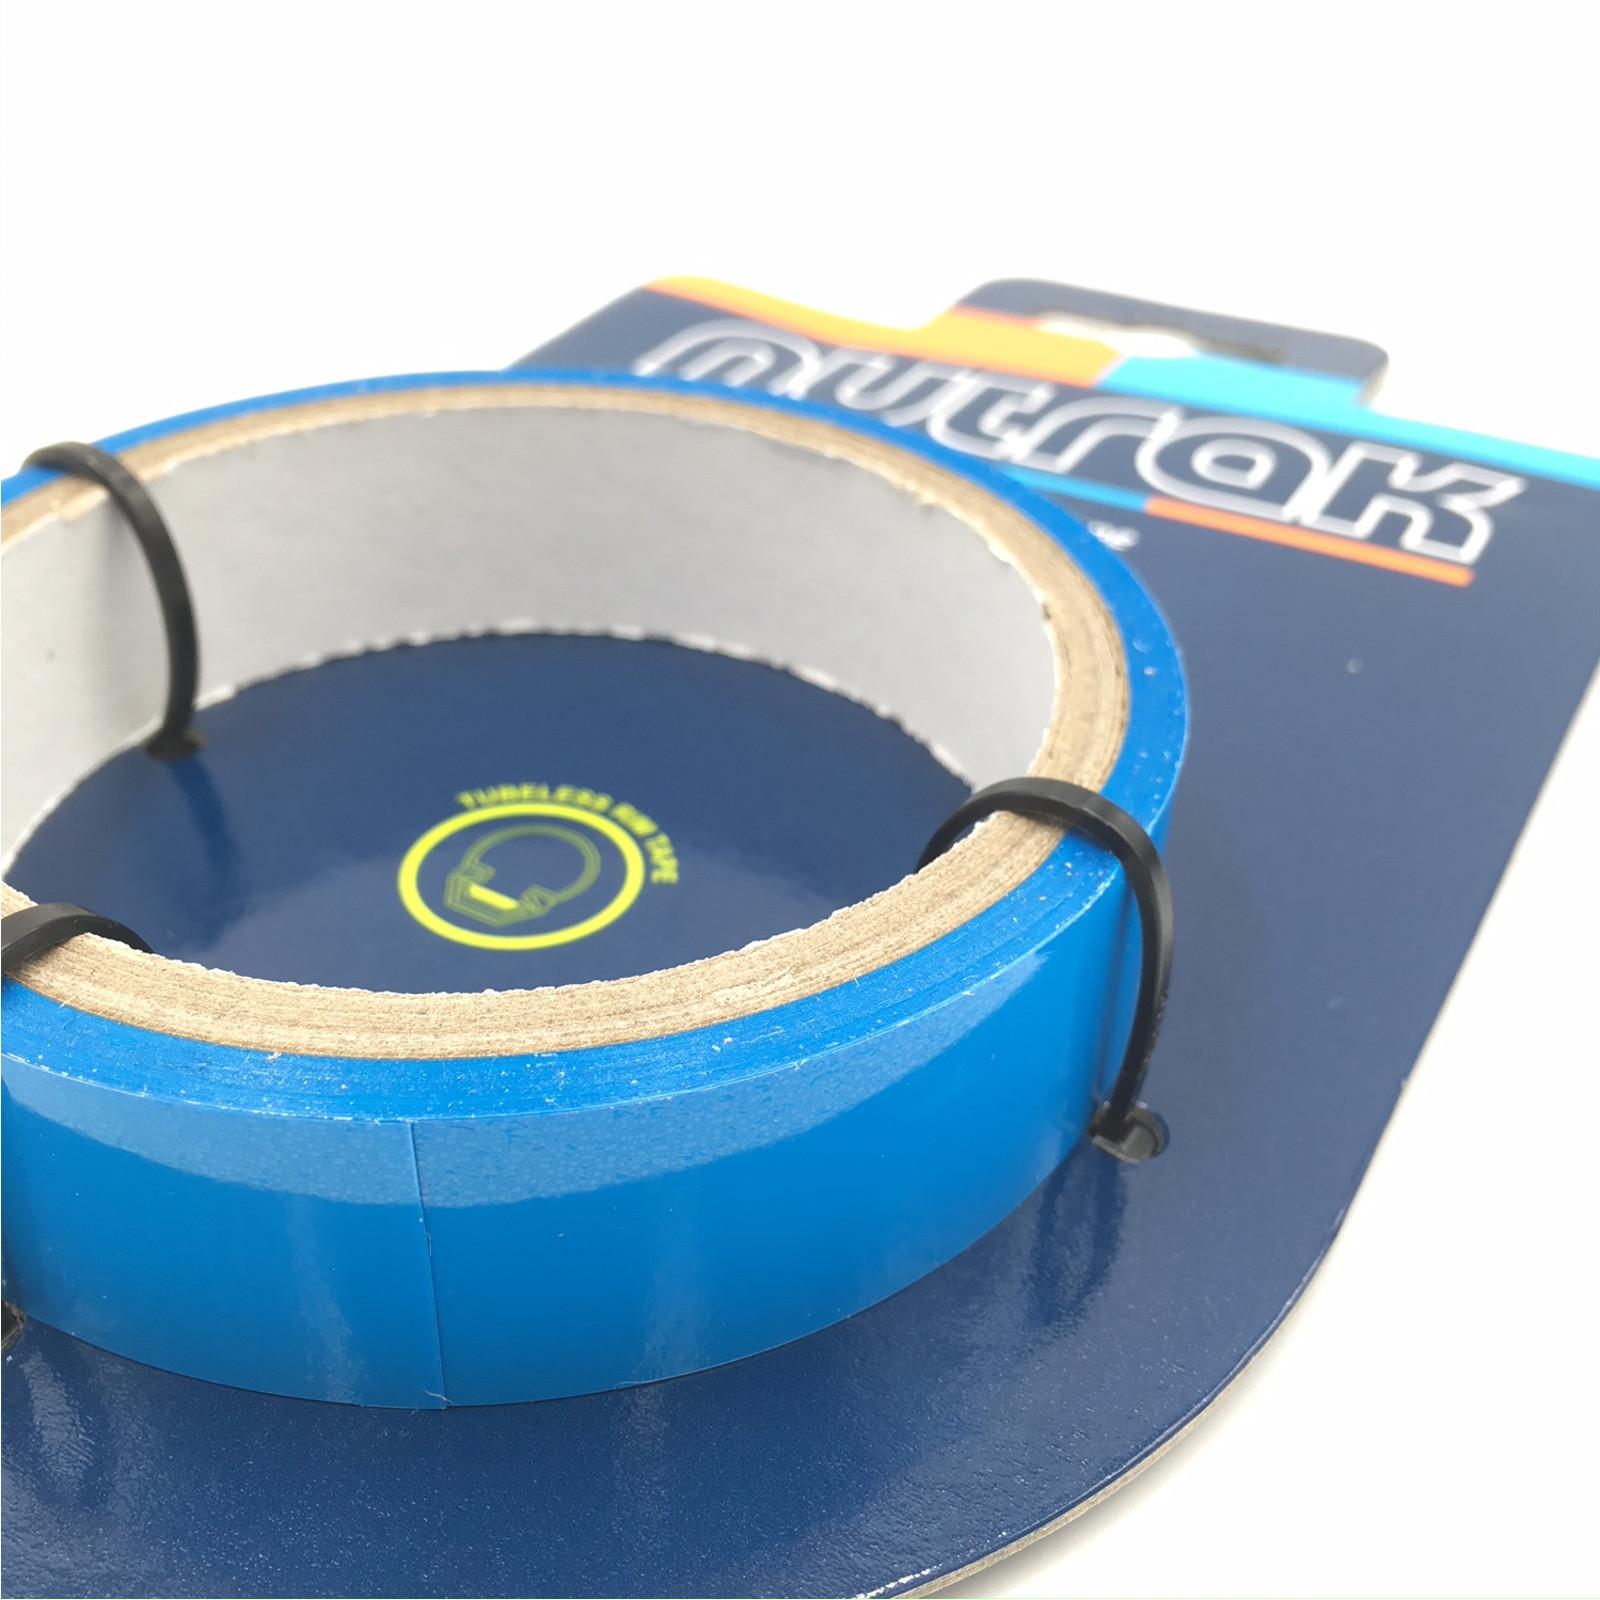 Nutrak-Tubeless-Ready-Waterproof-Rim-Tape-Blue-10m-Roll thumbnail 10